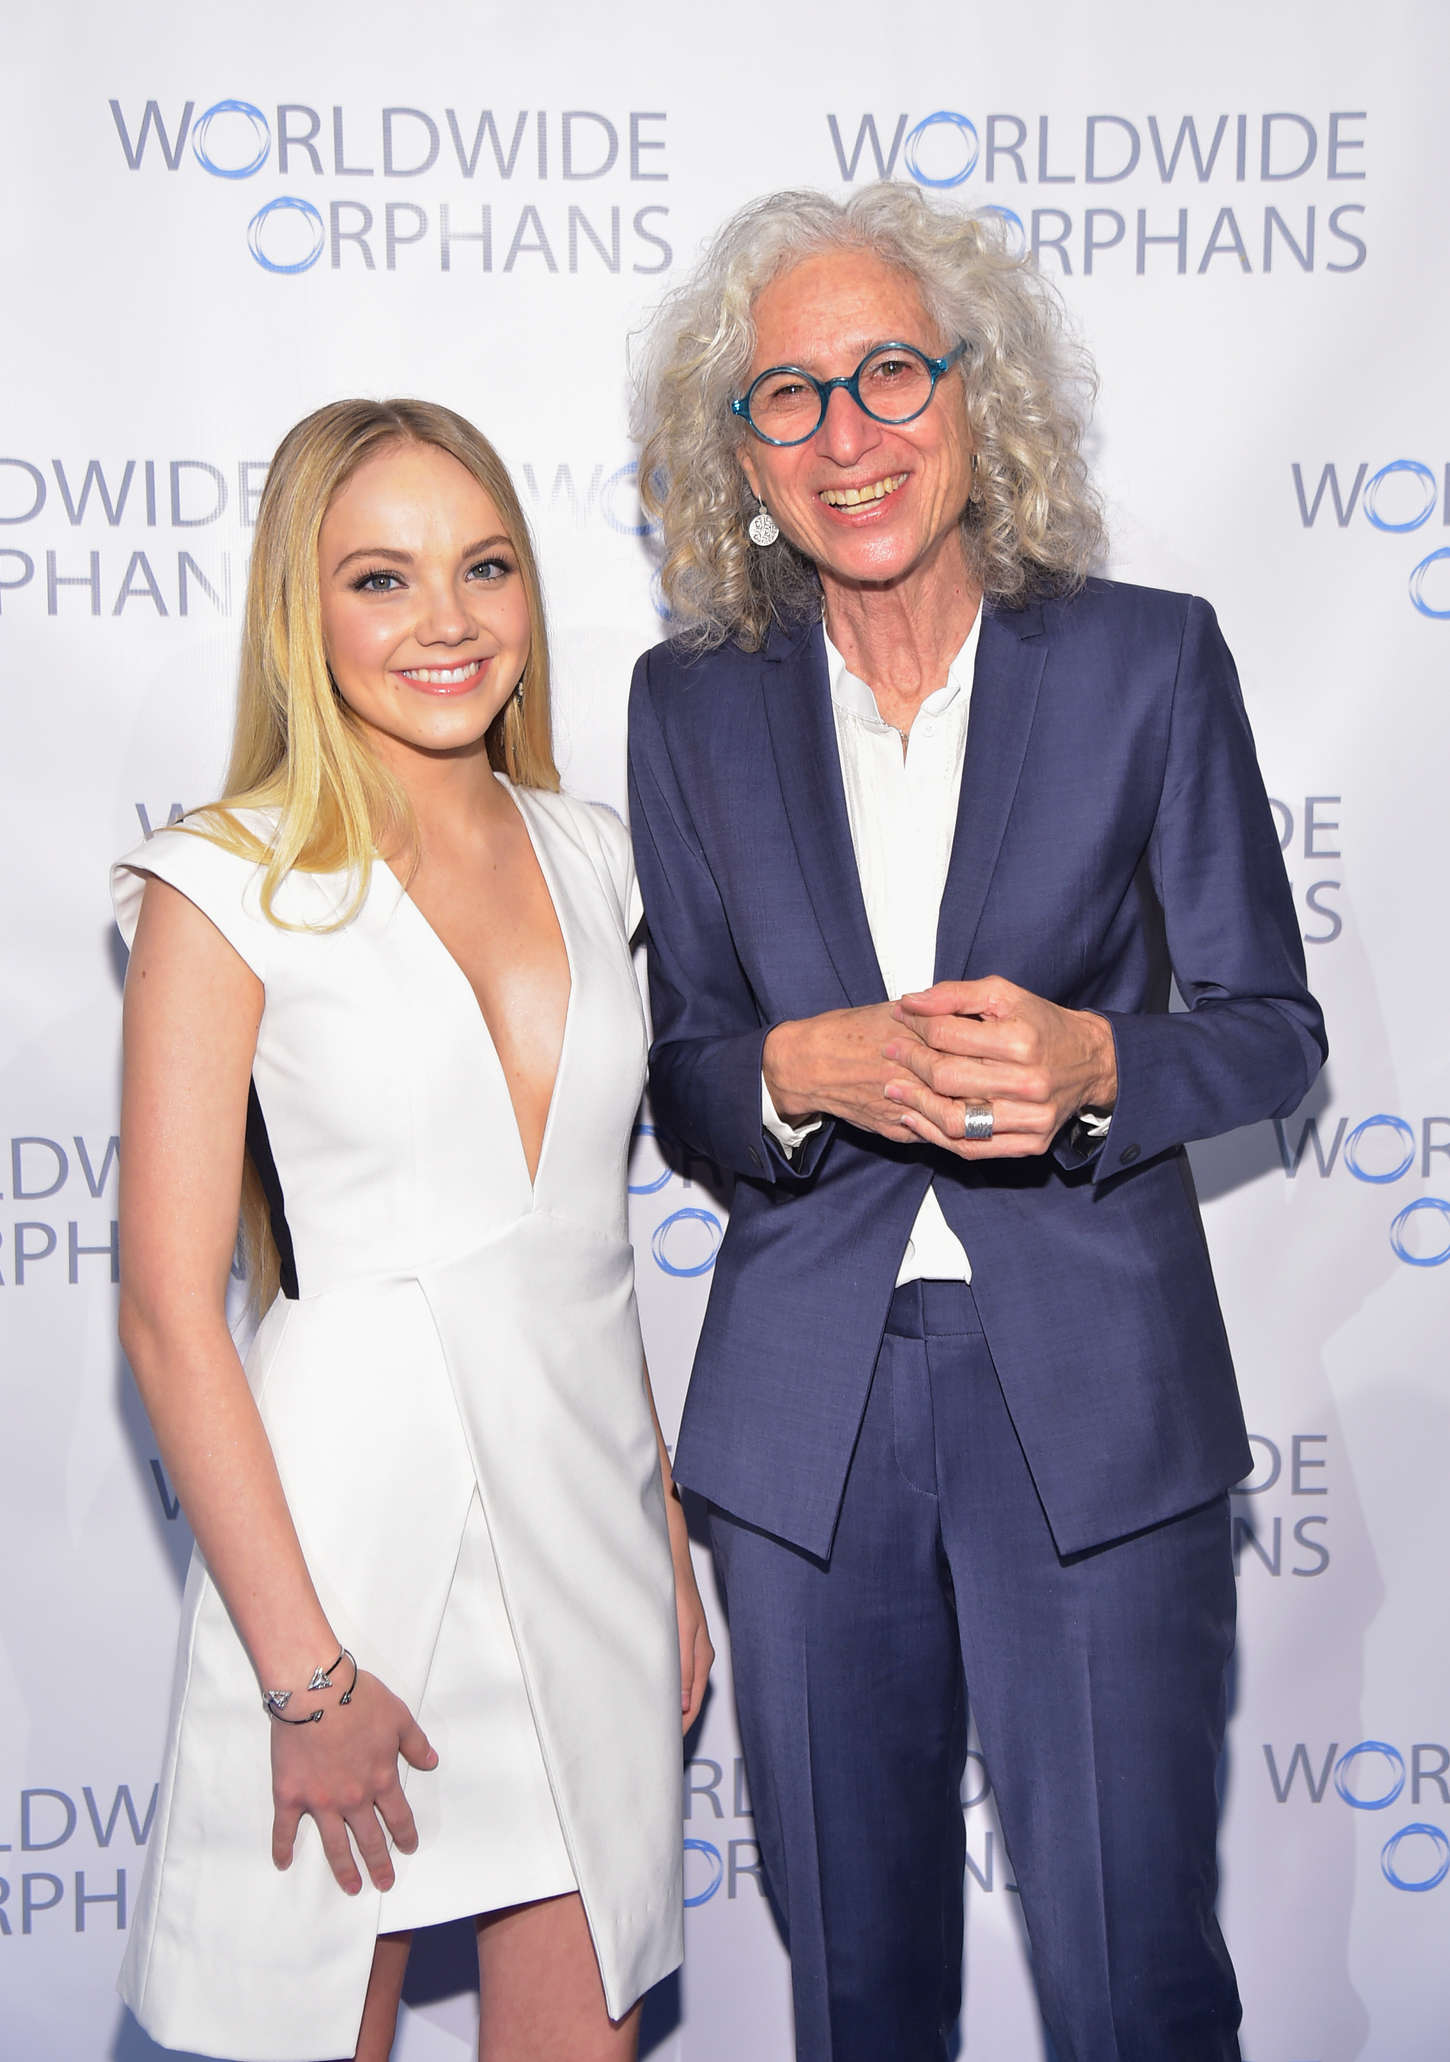 Danielle Bradbery Worldwide Orphans Annual Gala in New York